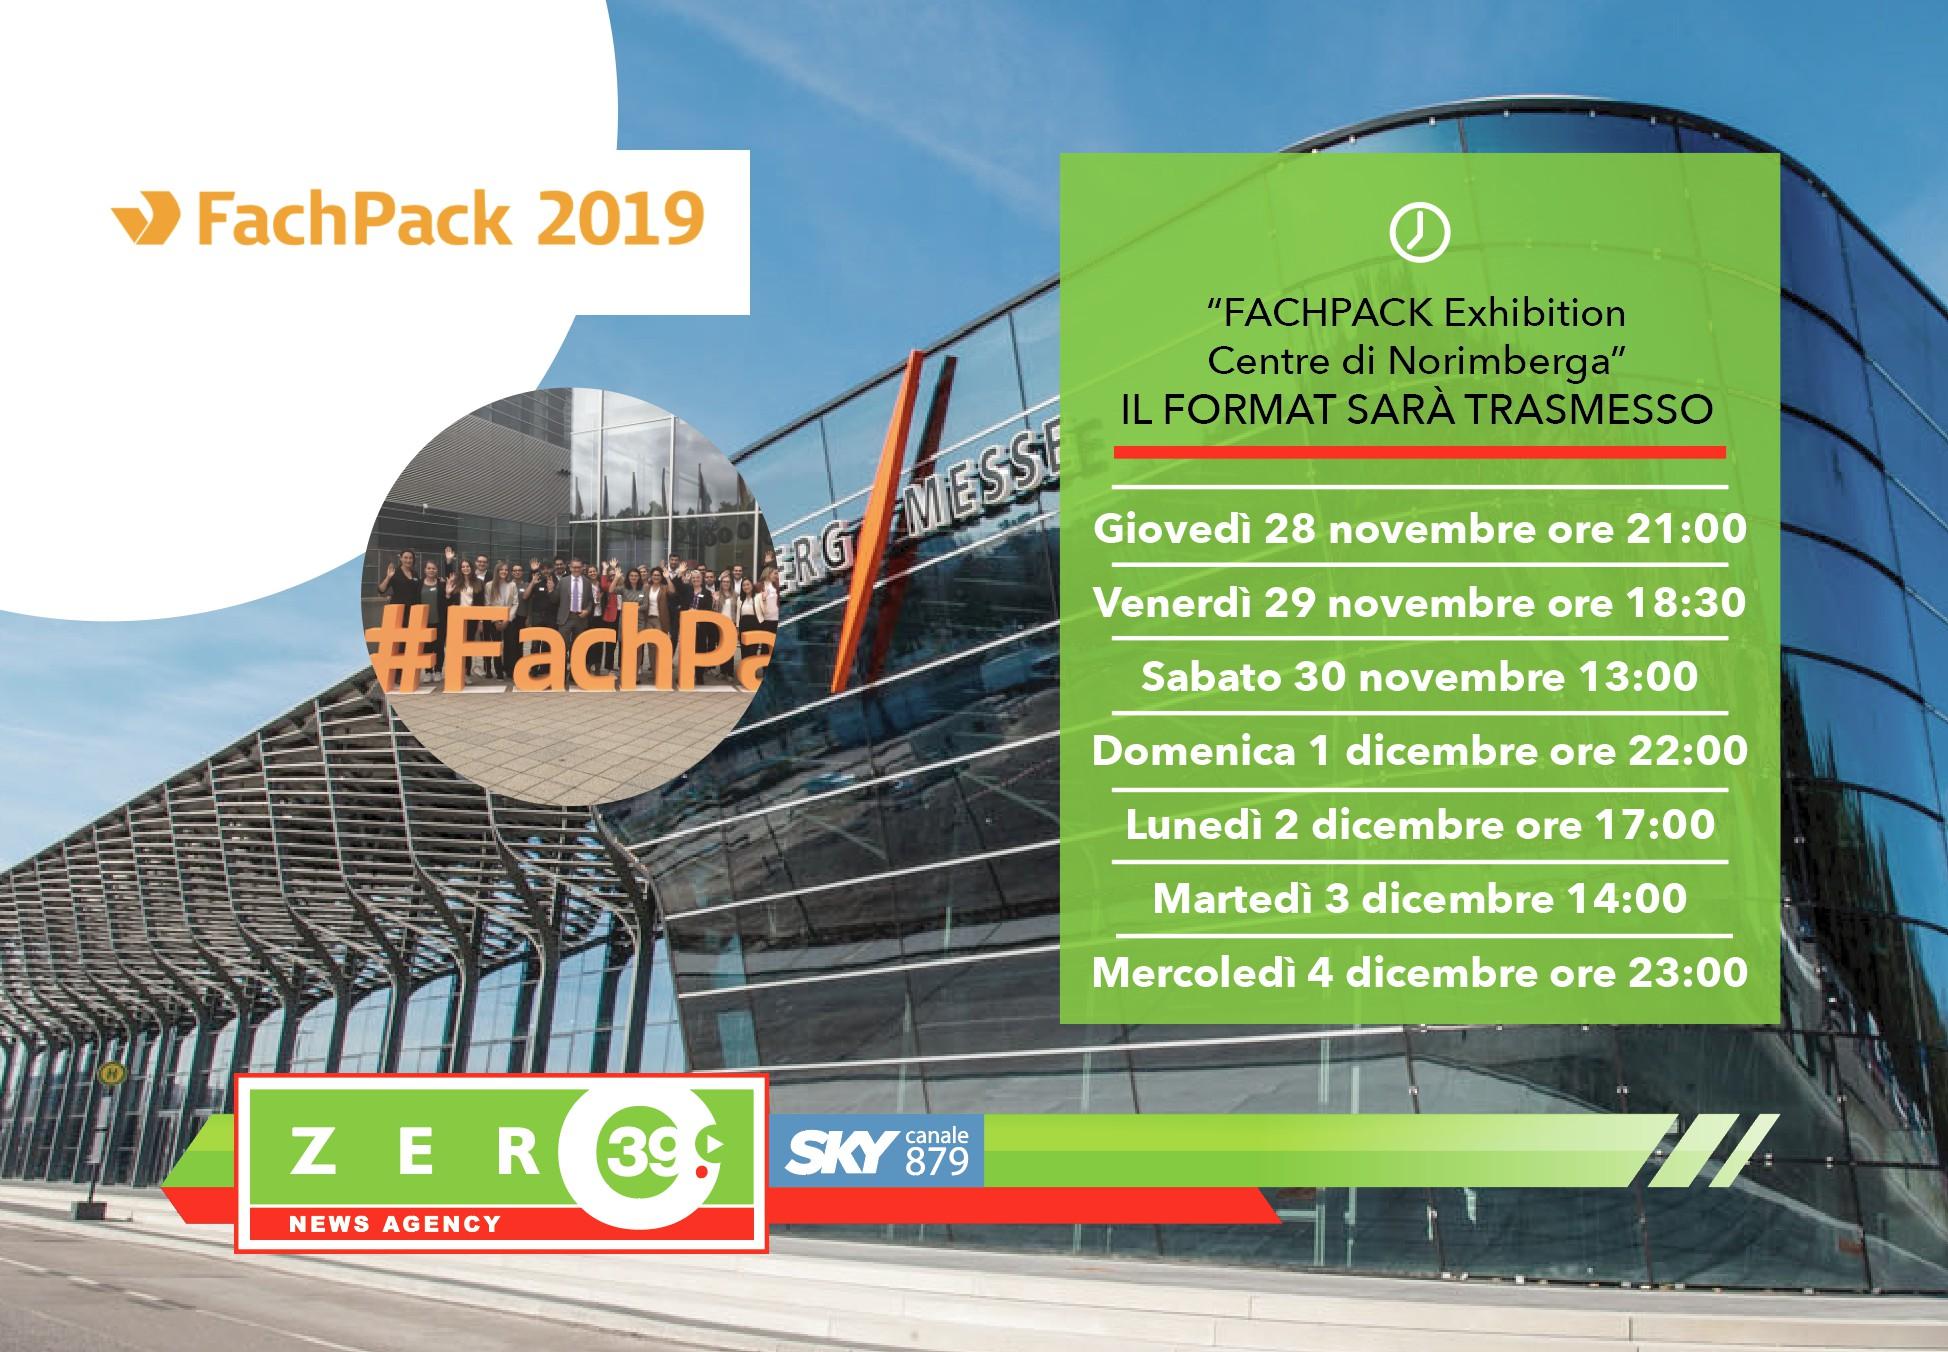 FACHPACK Exhibition Centre di Norimberga